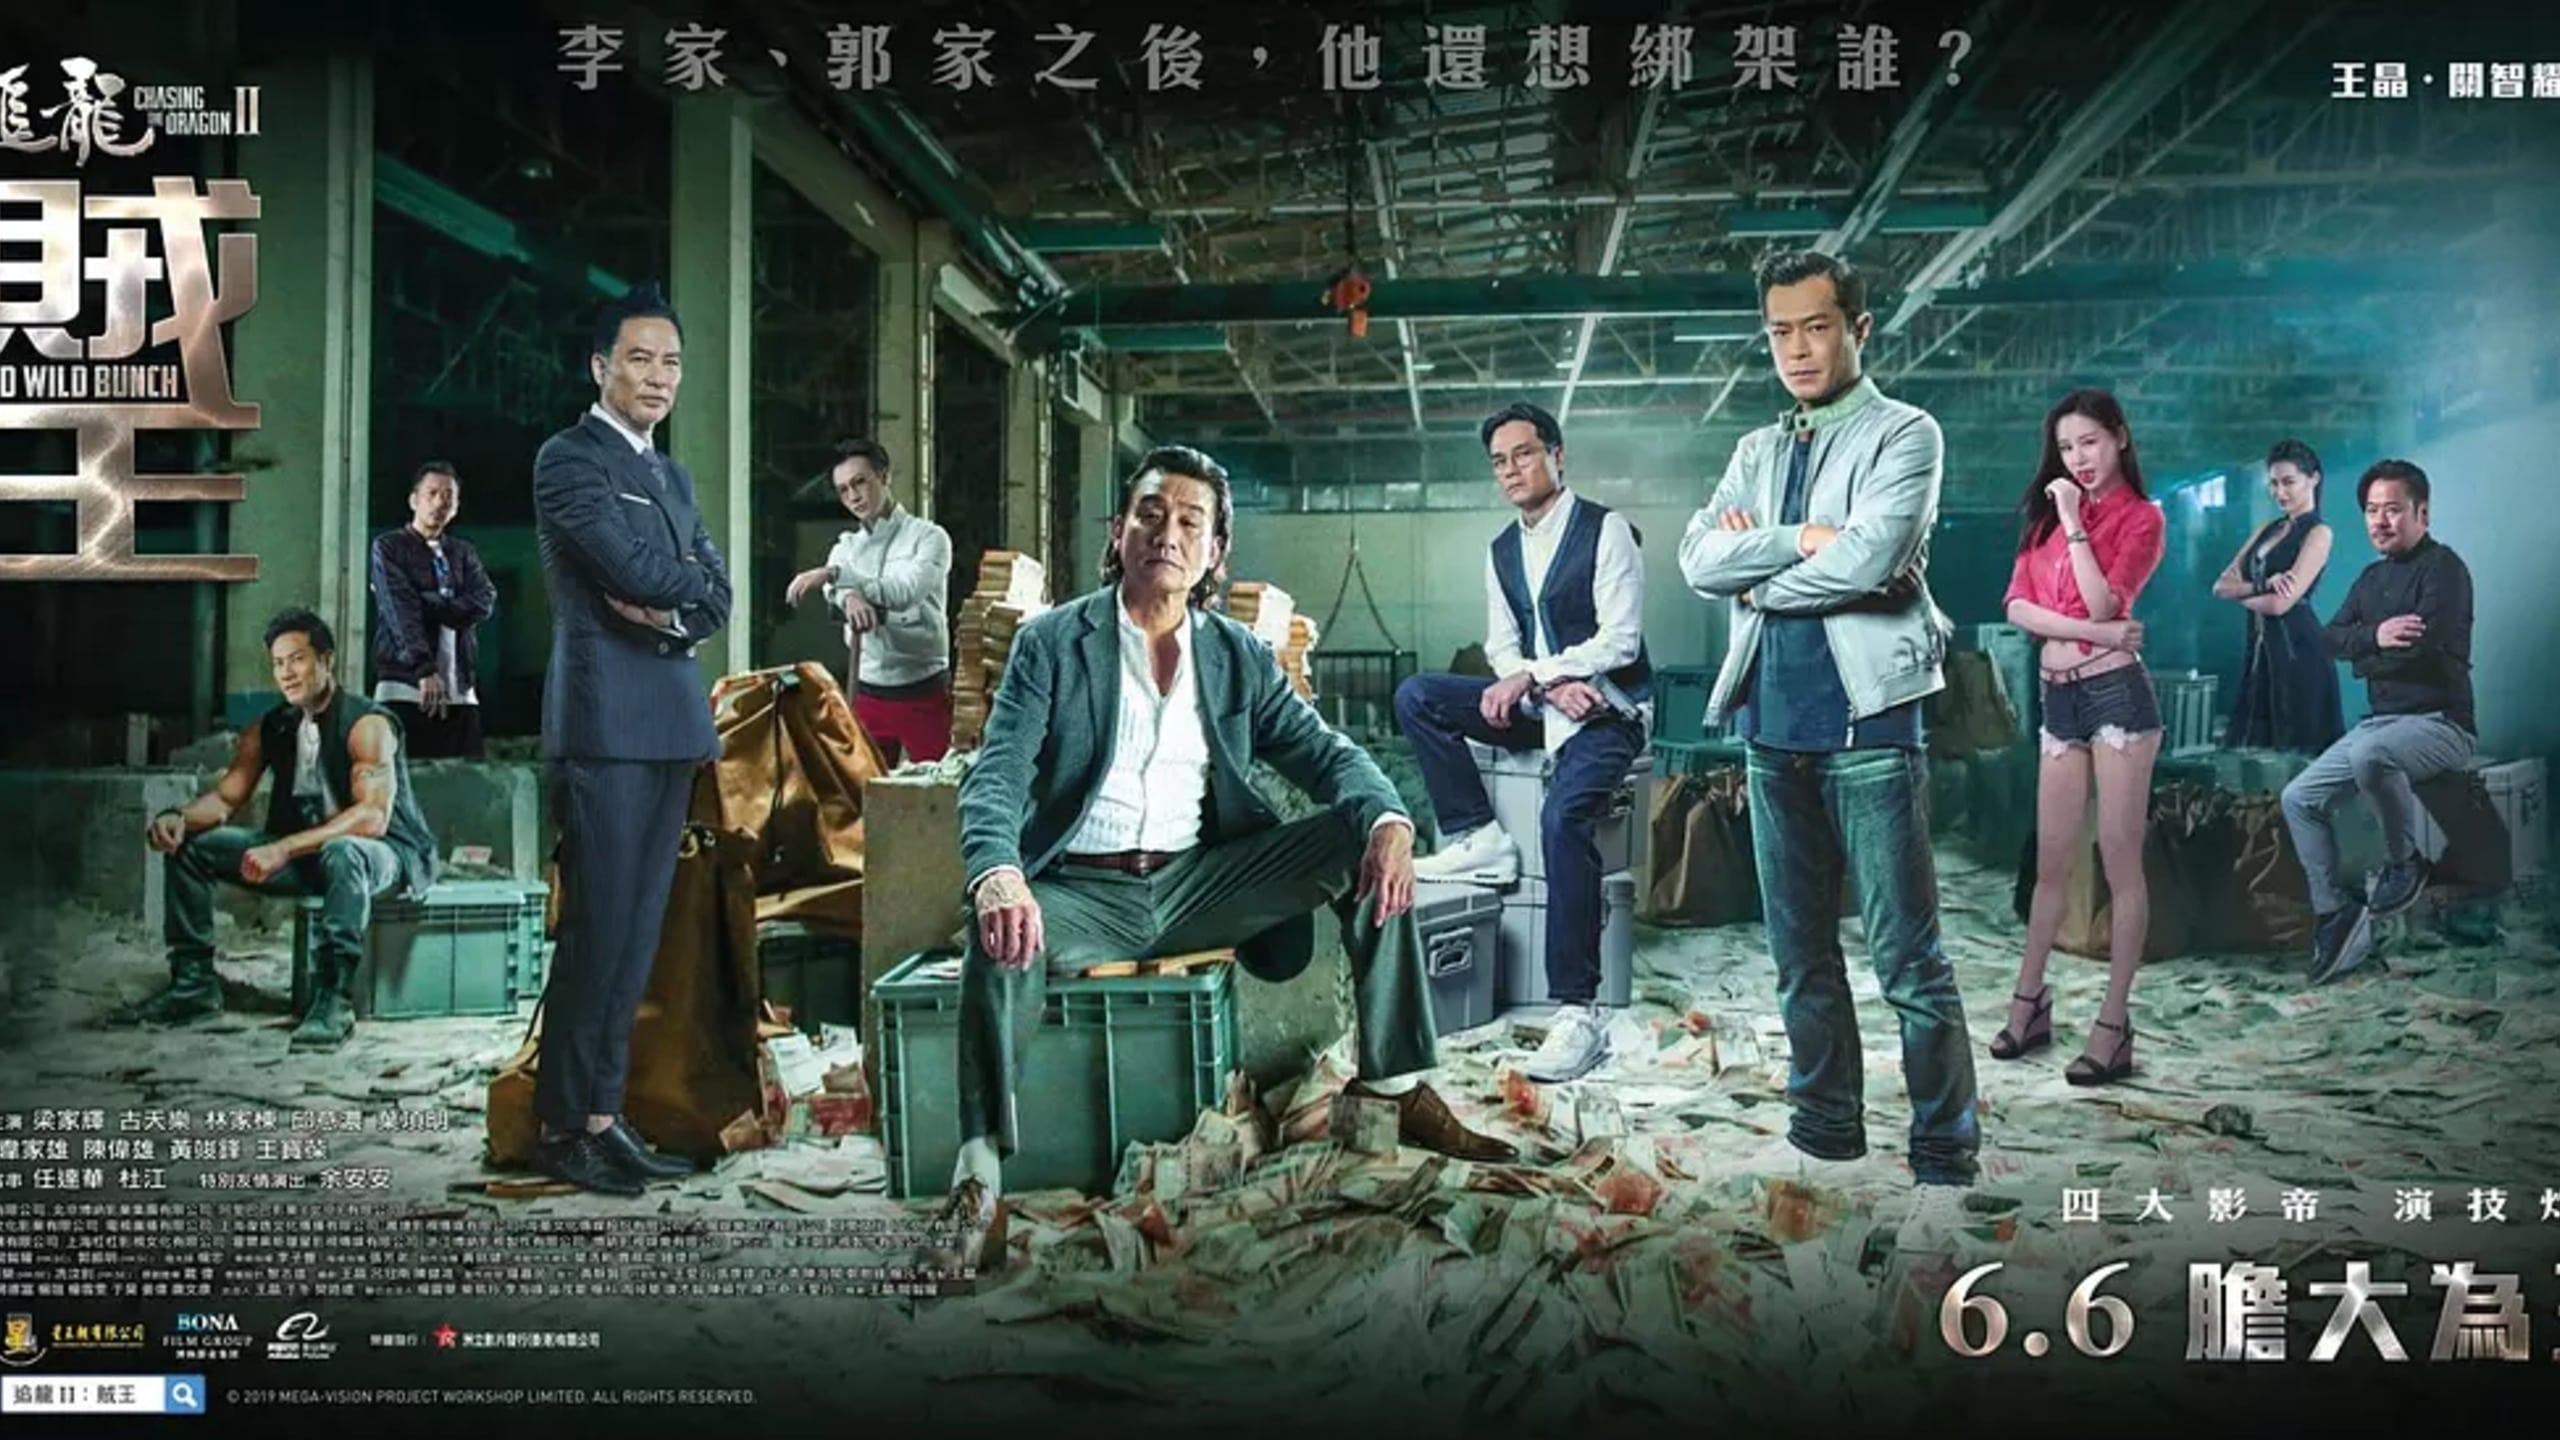 MCL電影《追龍II:賊王》字幕(港)線上看AV小鴨-HD粵 - walayya.over-blog.com